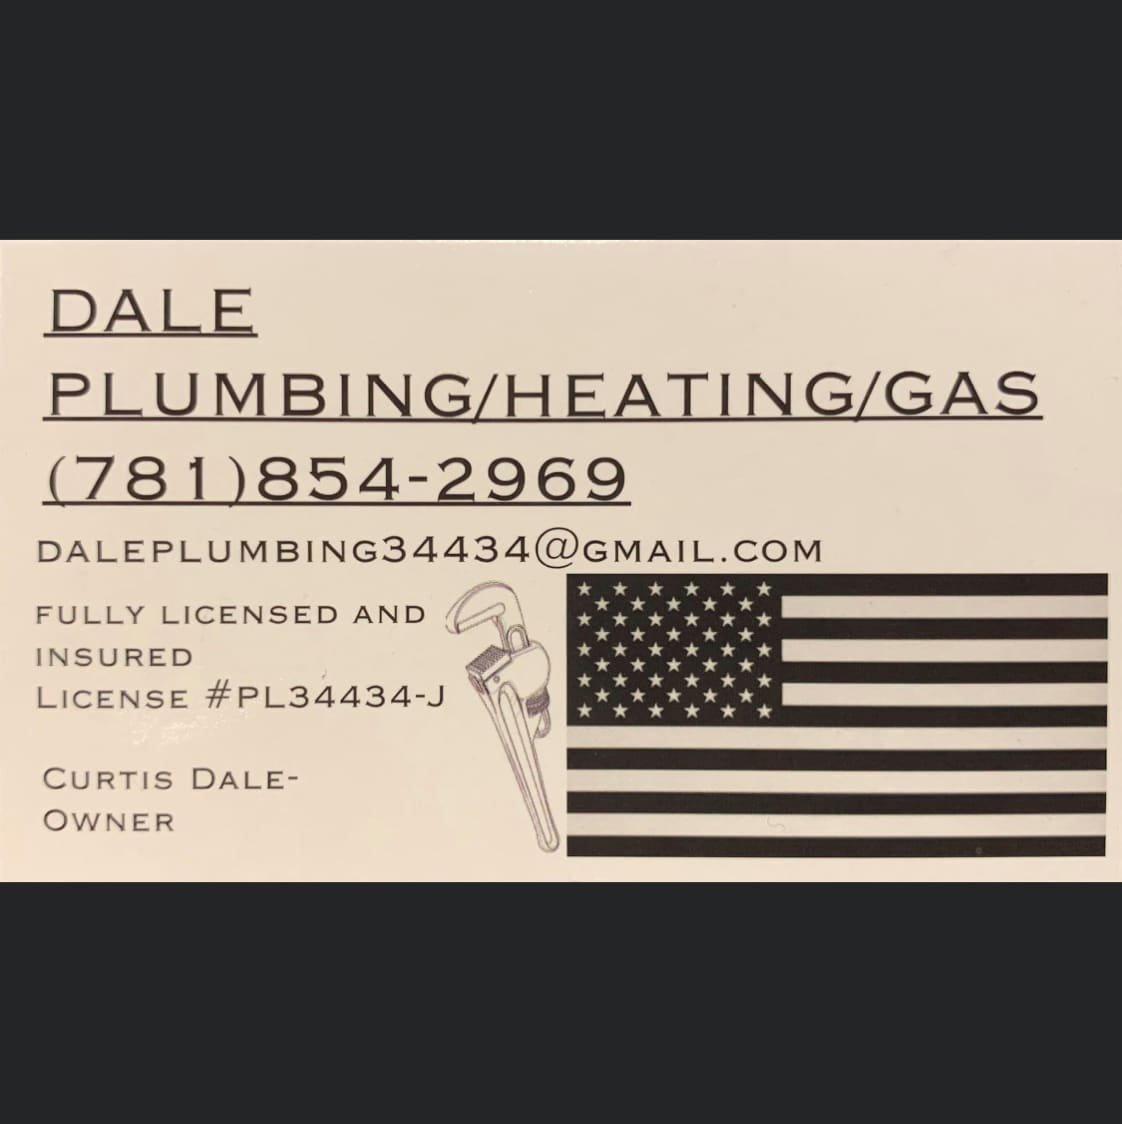 Dale Plumbing/Heating/Gas